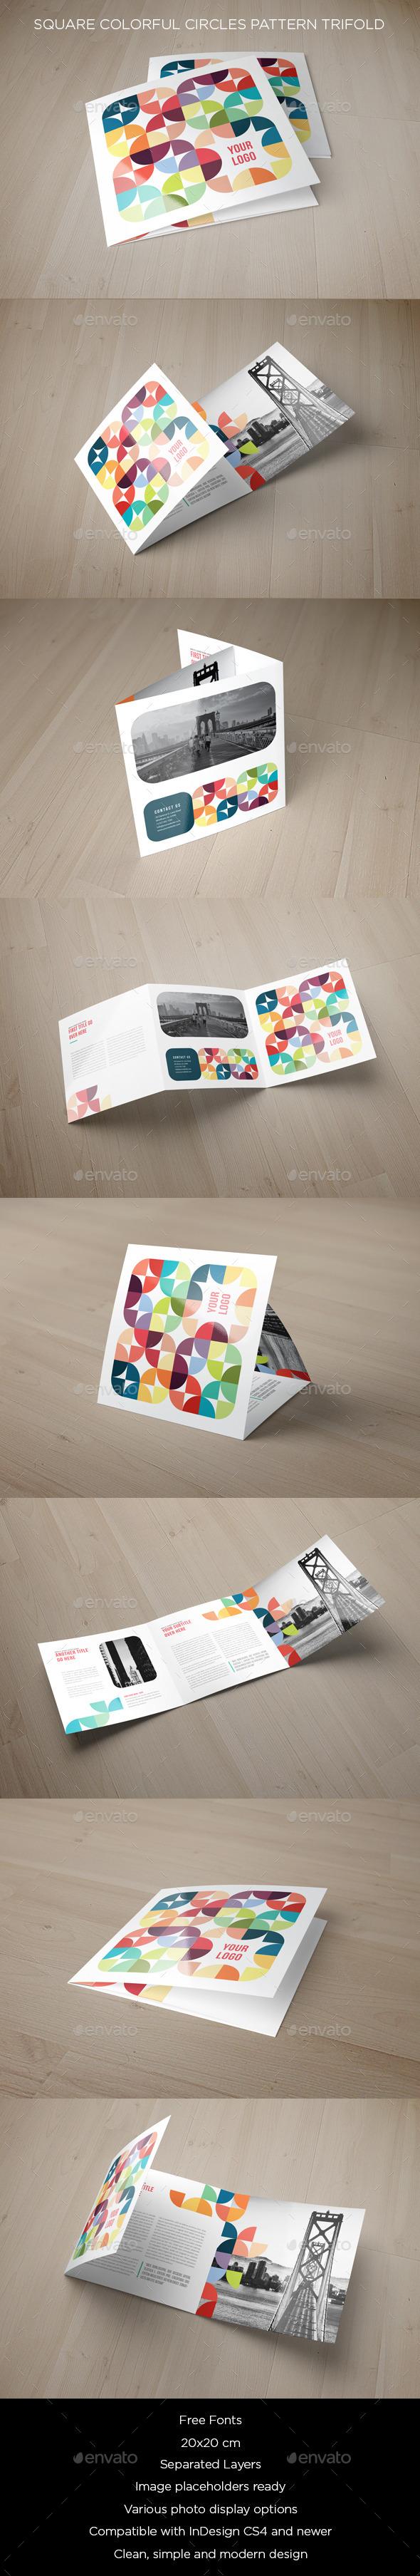 GraphicRiver Square Colorful Circles Pattern Trifold 10740784